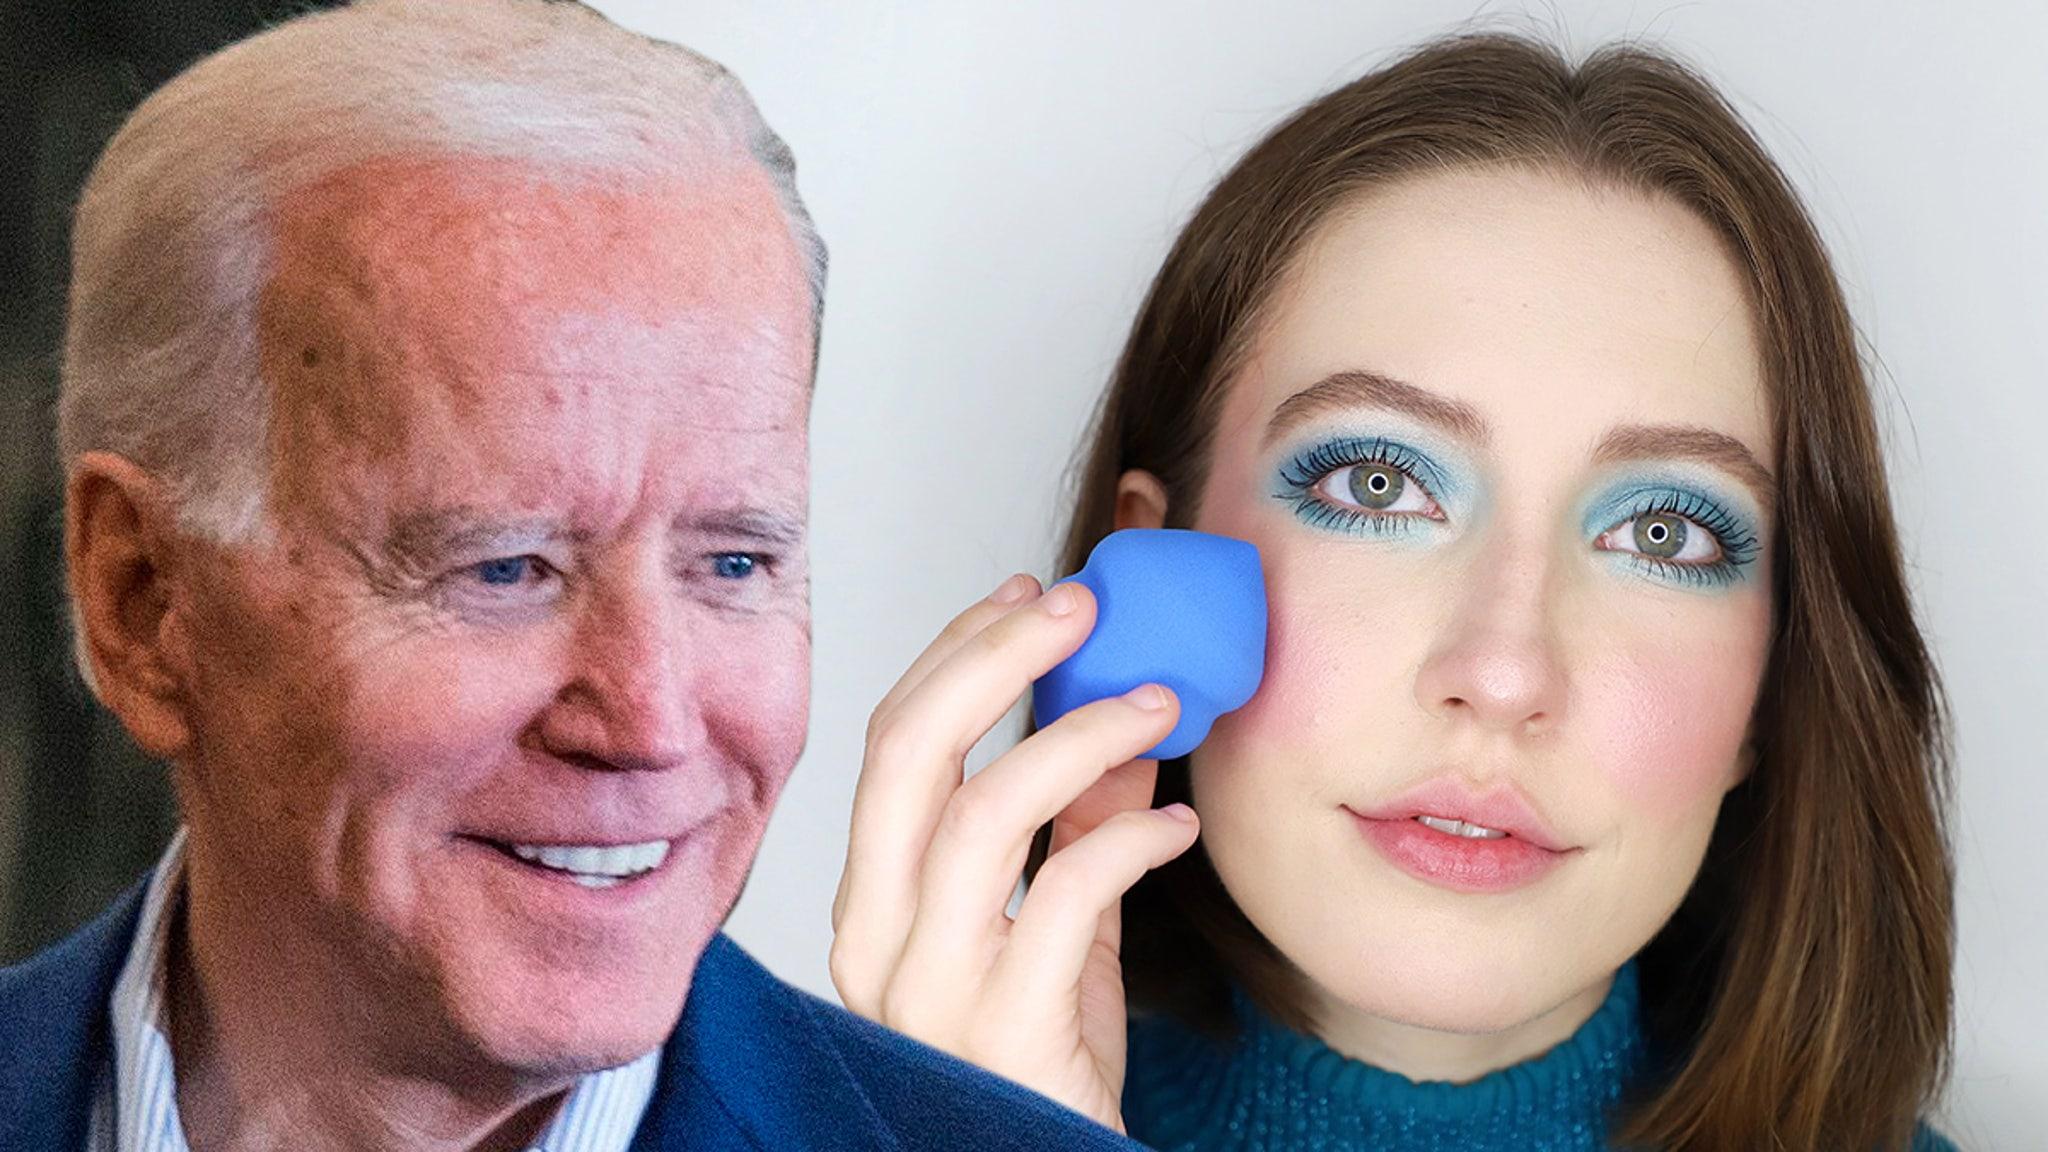 'BIDEN Beauty' Brand Booming, Raising Big Bucks for Joe's Campaign